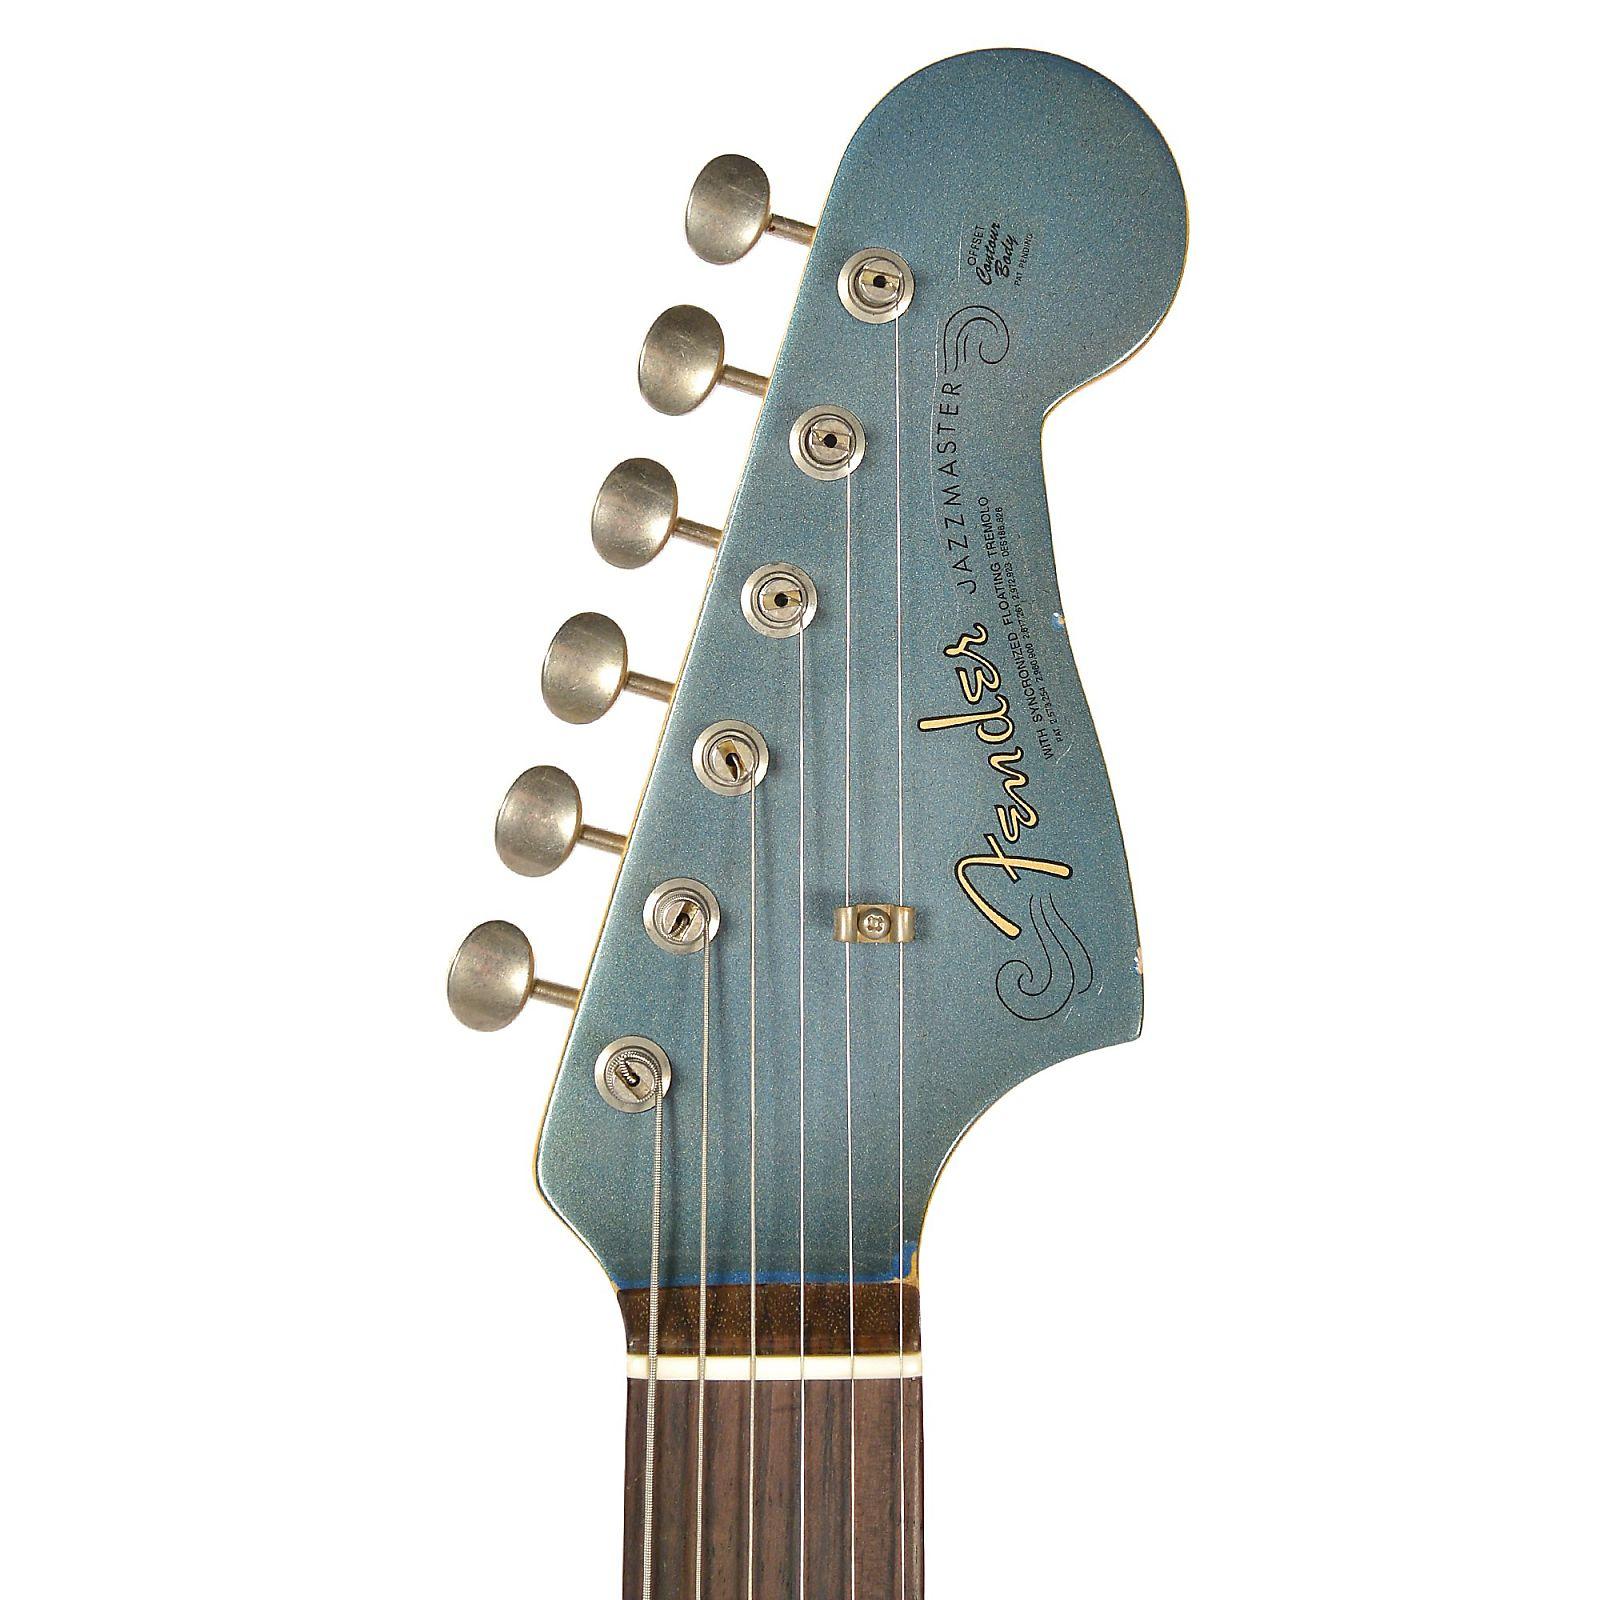 Fender Custom Shop 1962 Jazzmaster Journeyman Relic Super Aged Lake 2 Pickup Guitar Wiring Placid Blue Cme Spec